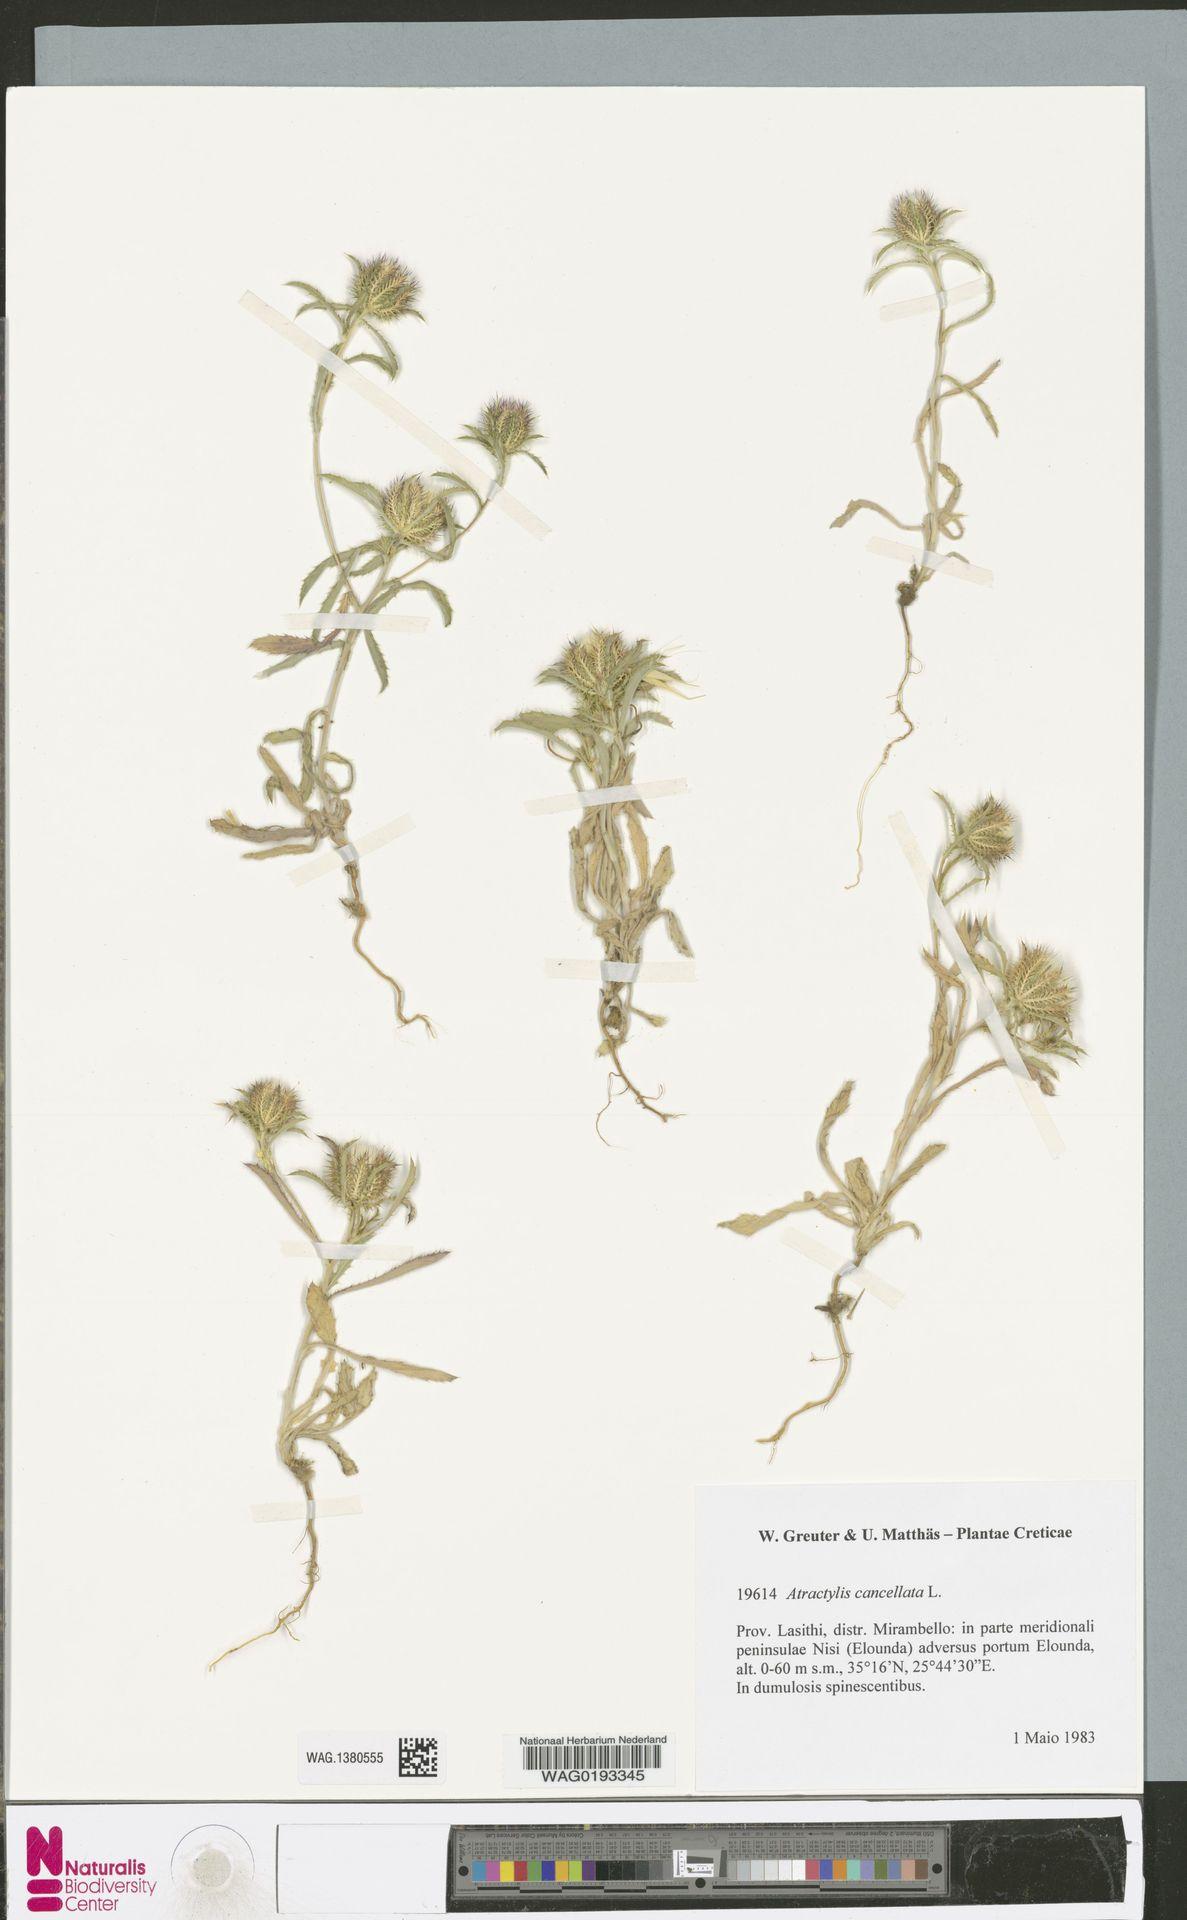 WAG.1380555 | Atractylis cancellata L.